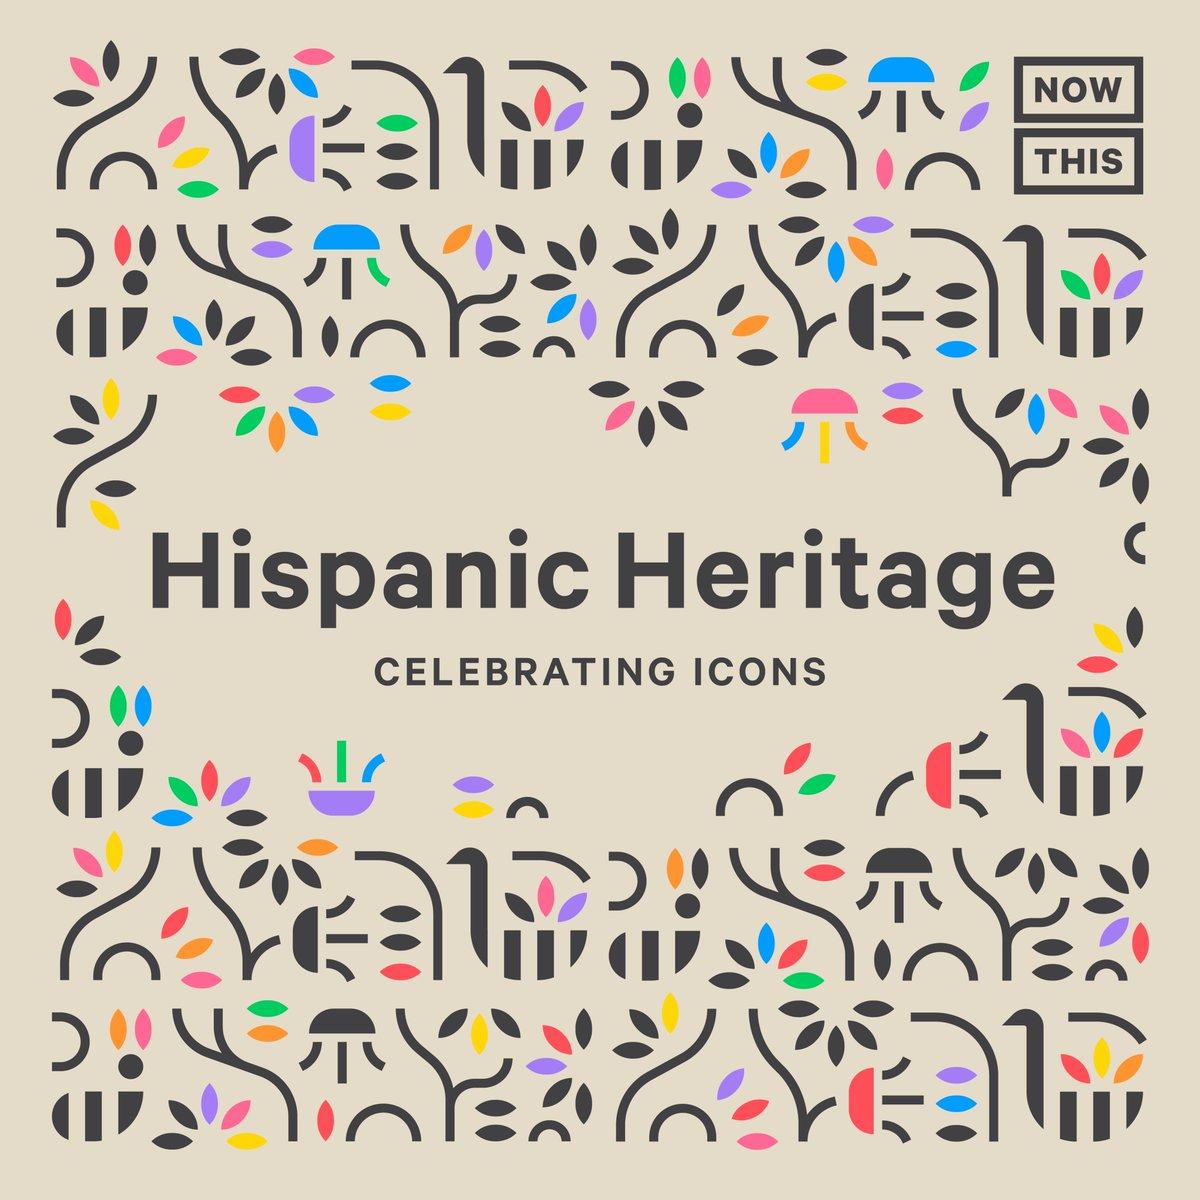 @nowthisnews's photo on #HispanicHeritageMonth